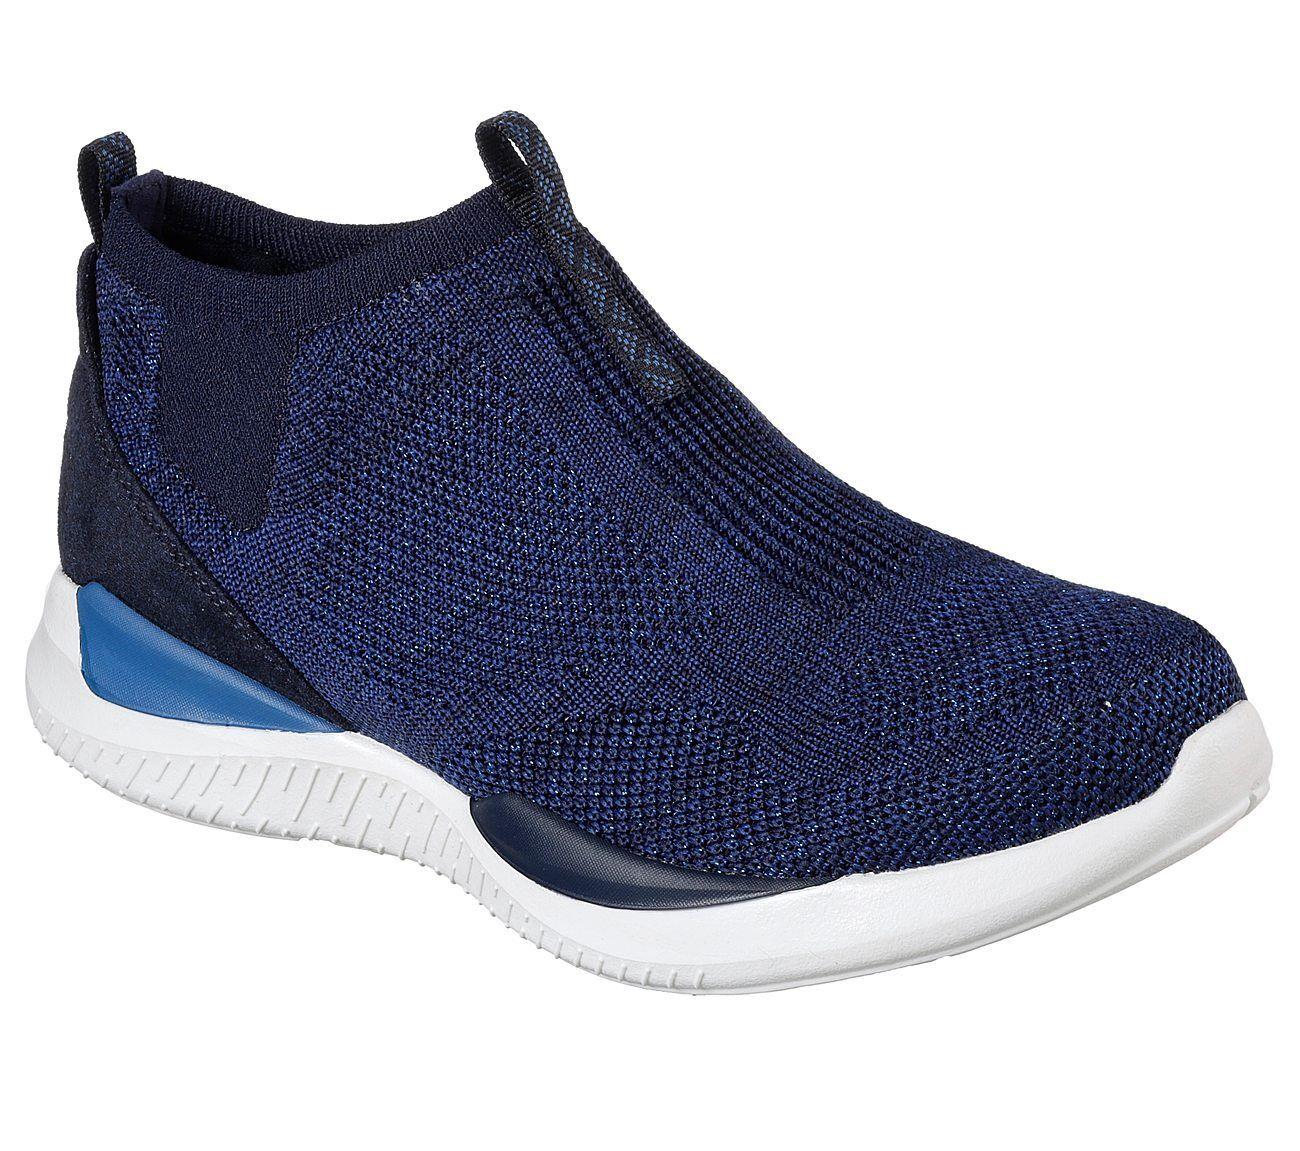 Skechers Matrixx - Modern Essential Trainers Womens Memory Foam Knit Shoes 12459